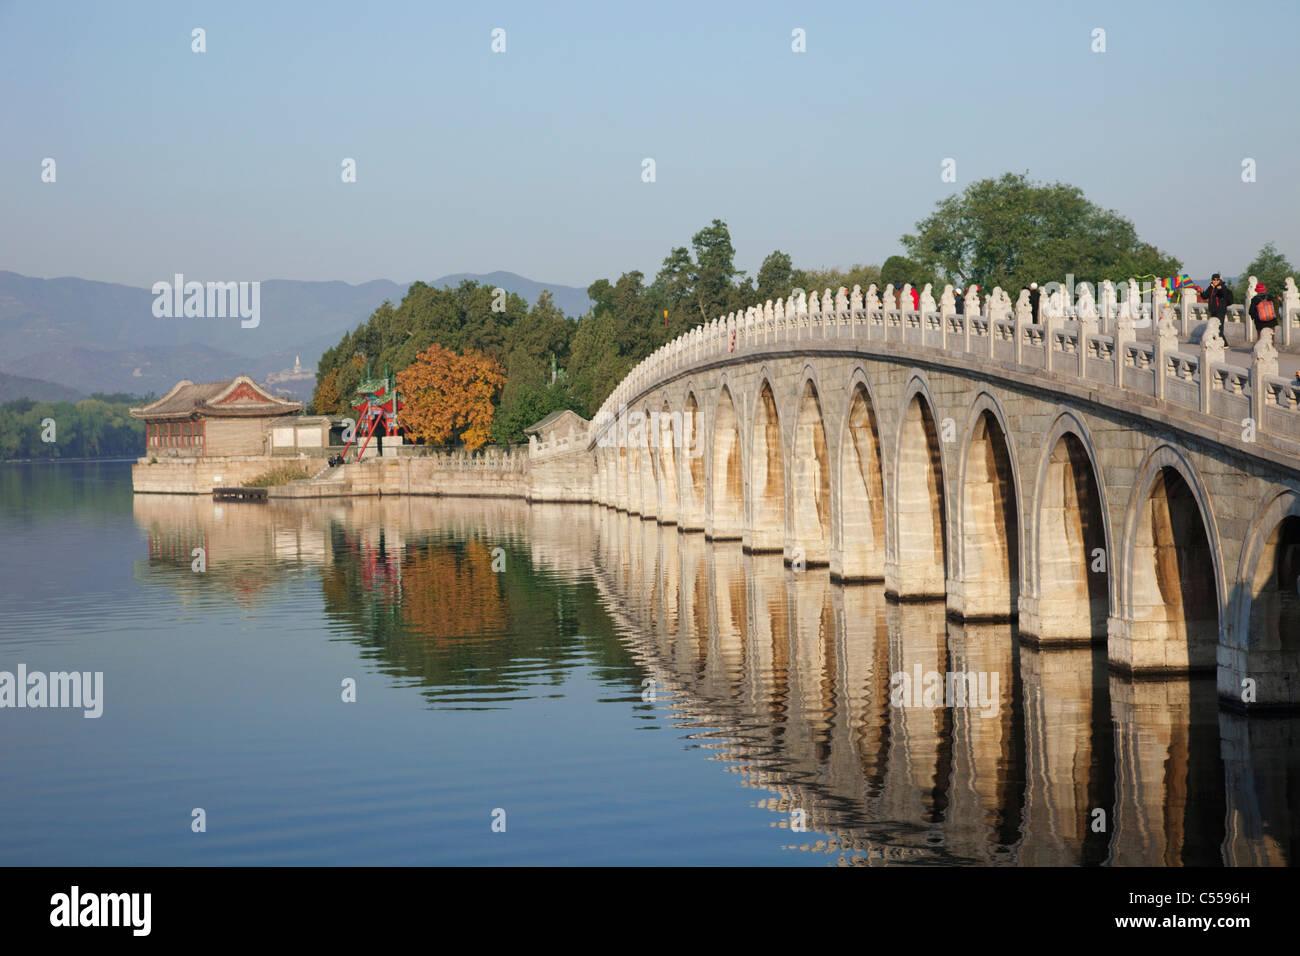 Arch bridge across a lake, Seventeen-Arch Bridge, Kunming Lake, Summer Palace, Beijing, China - Stock Image